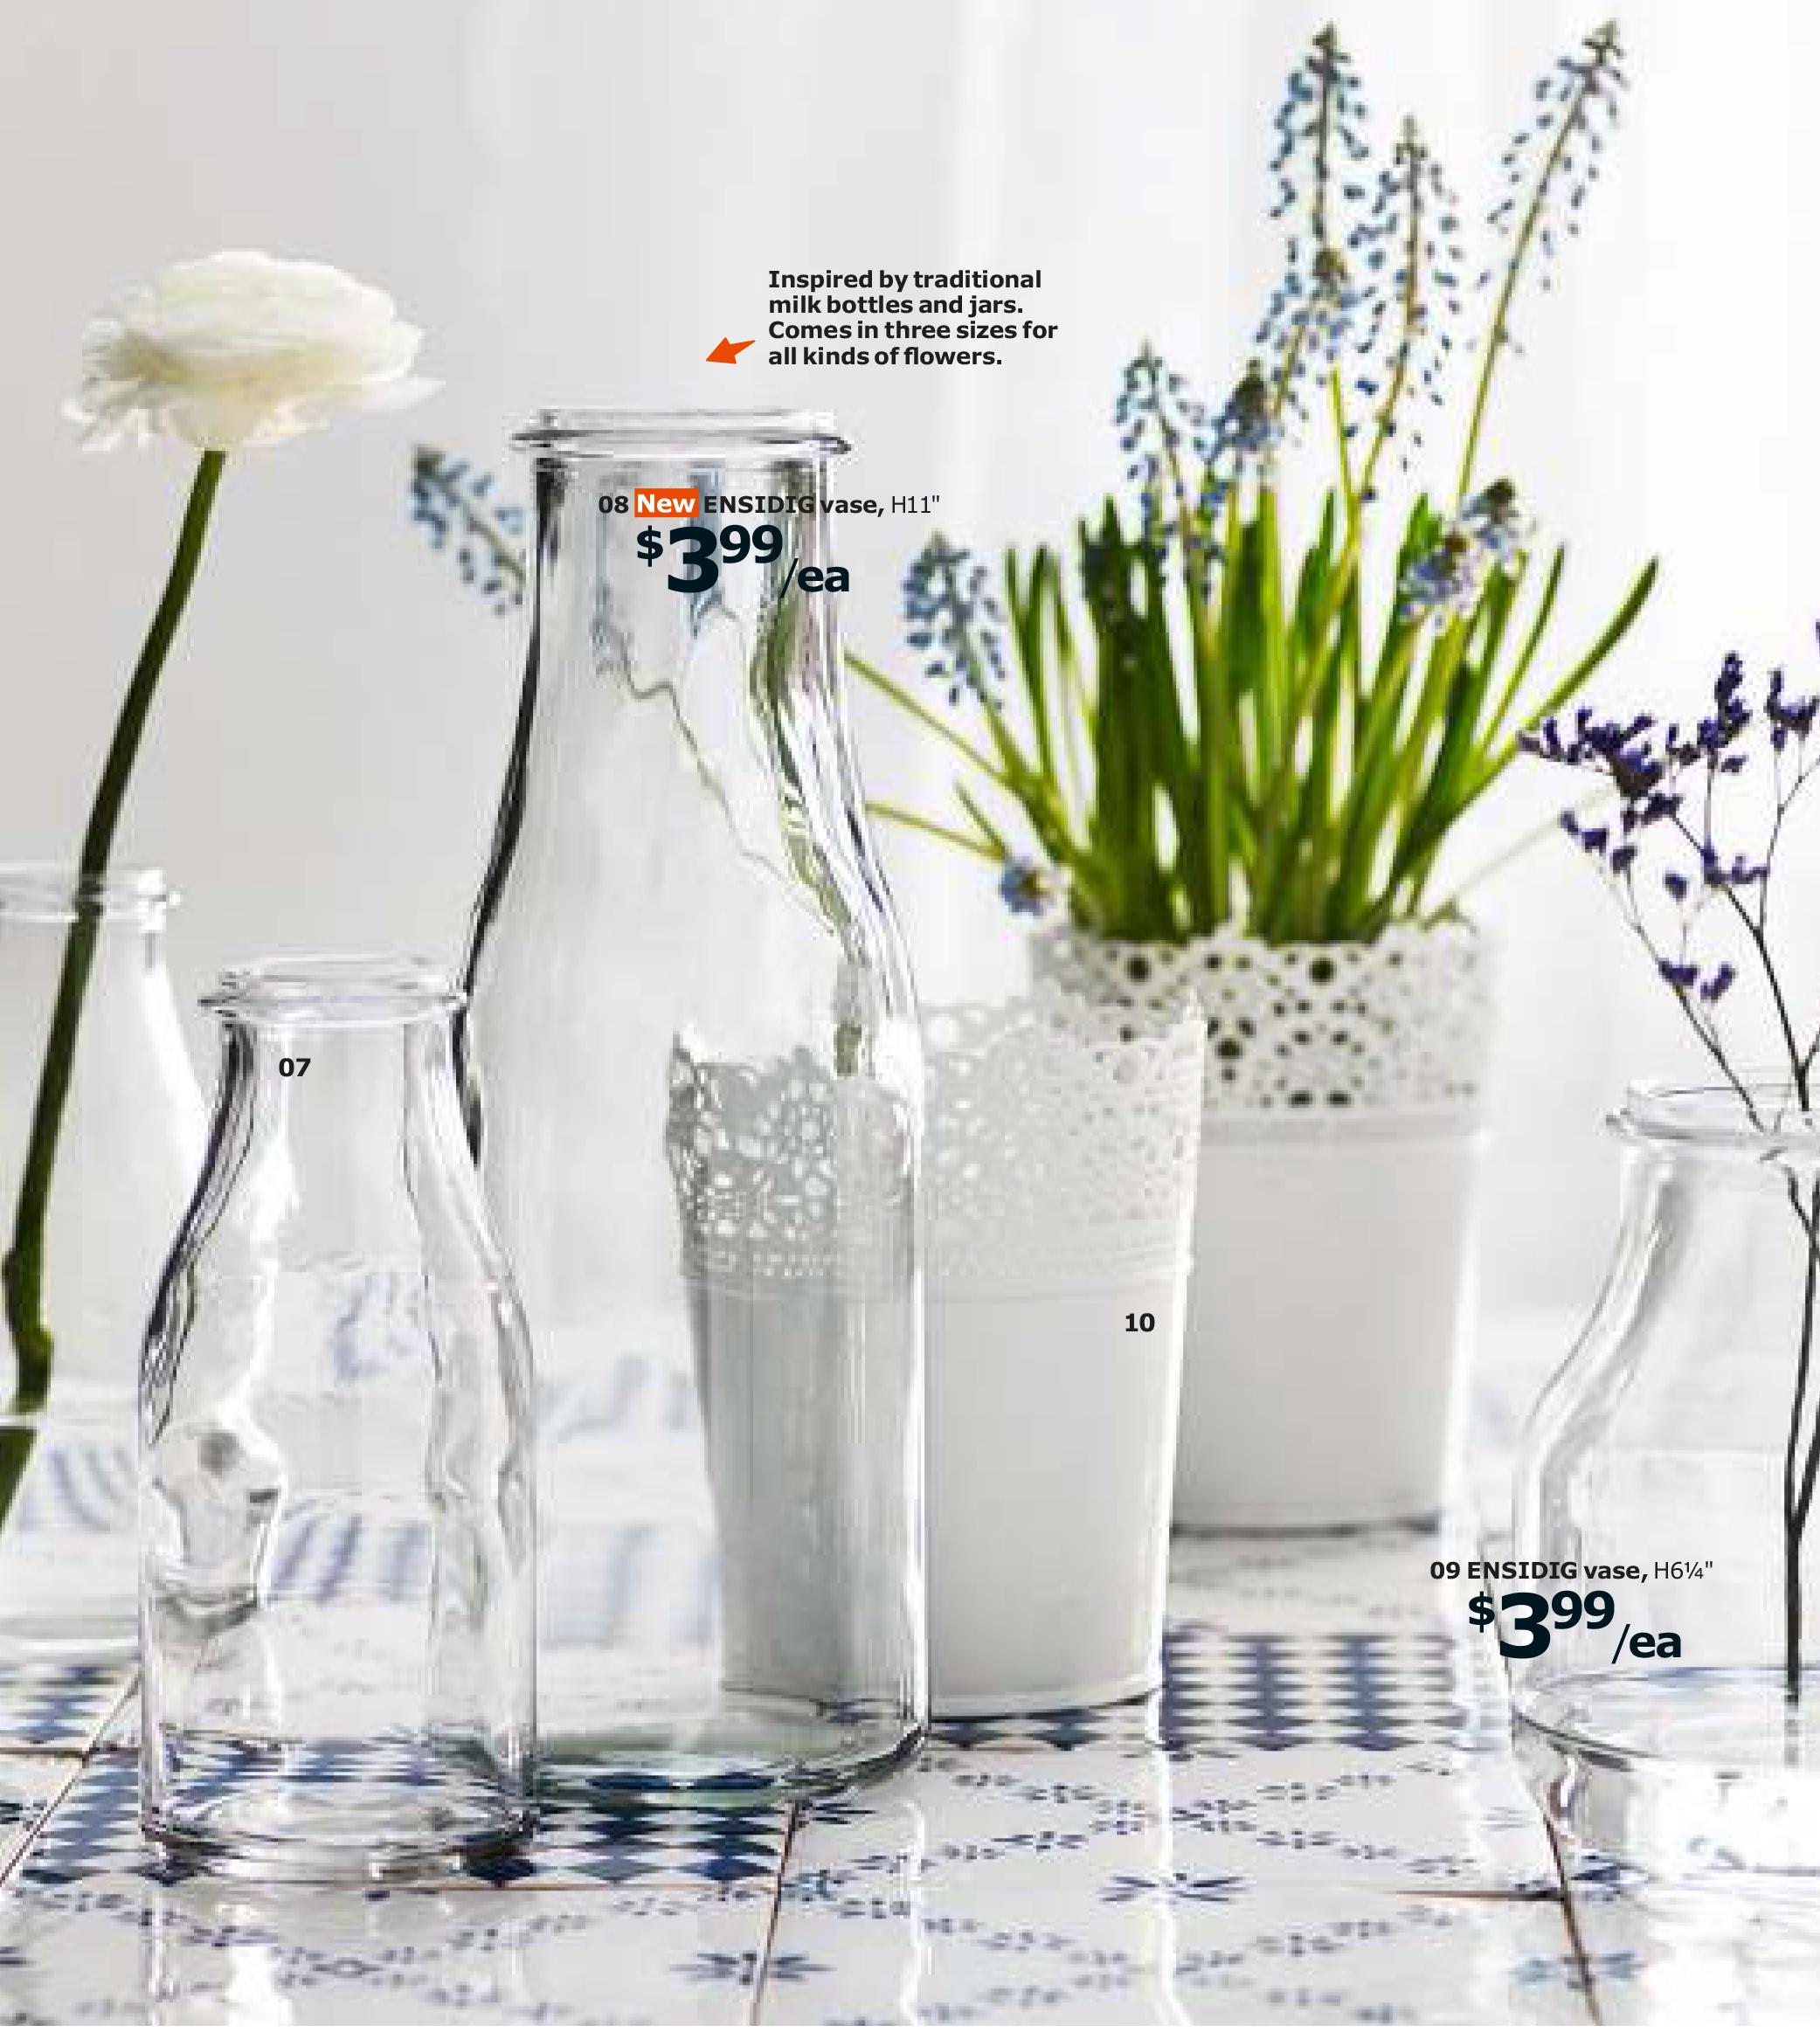 Ensidig vases 199 399 ikea 2014 pinterest ikea 2014 and ensidig vases 199 399 reviewsmspy